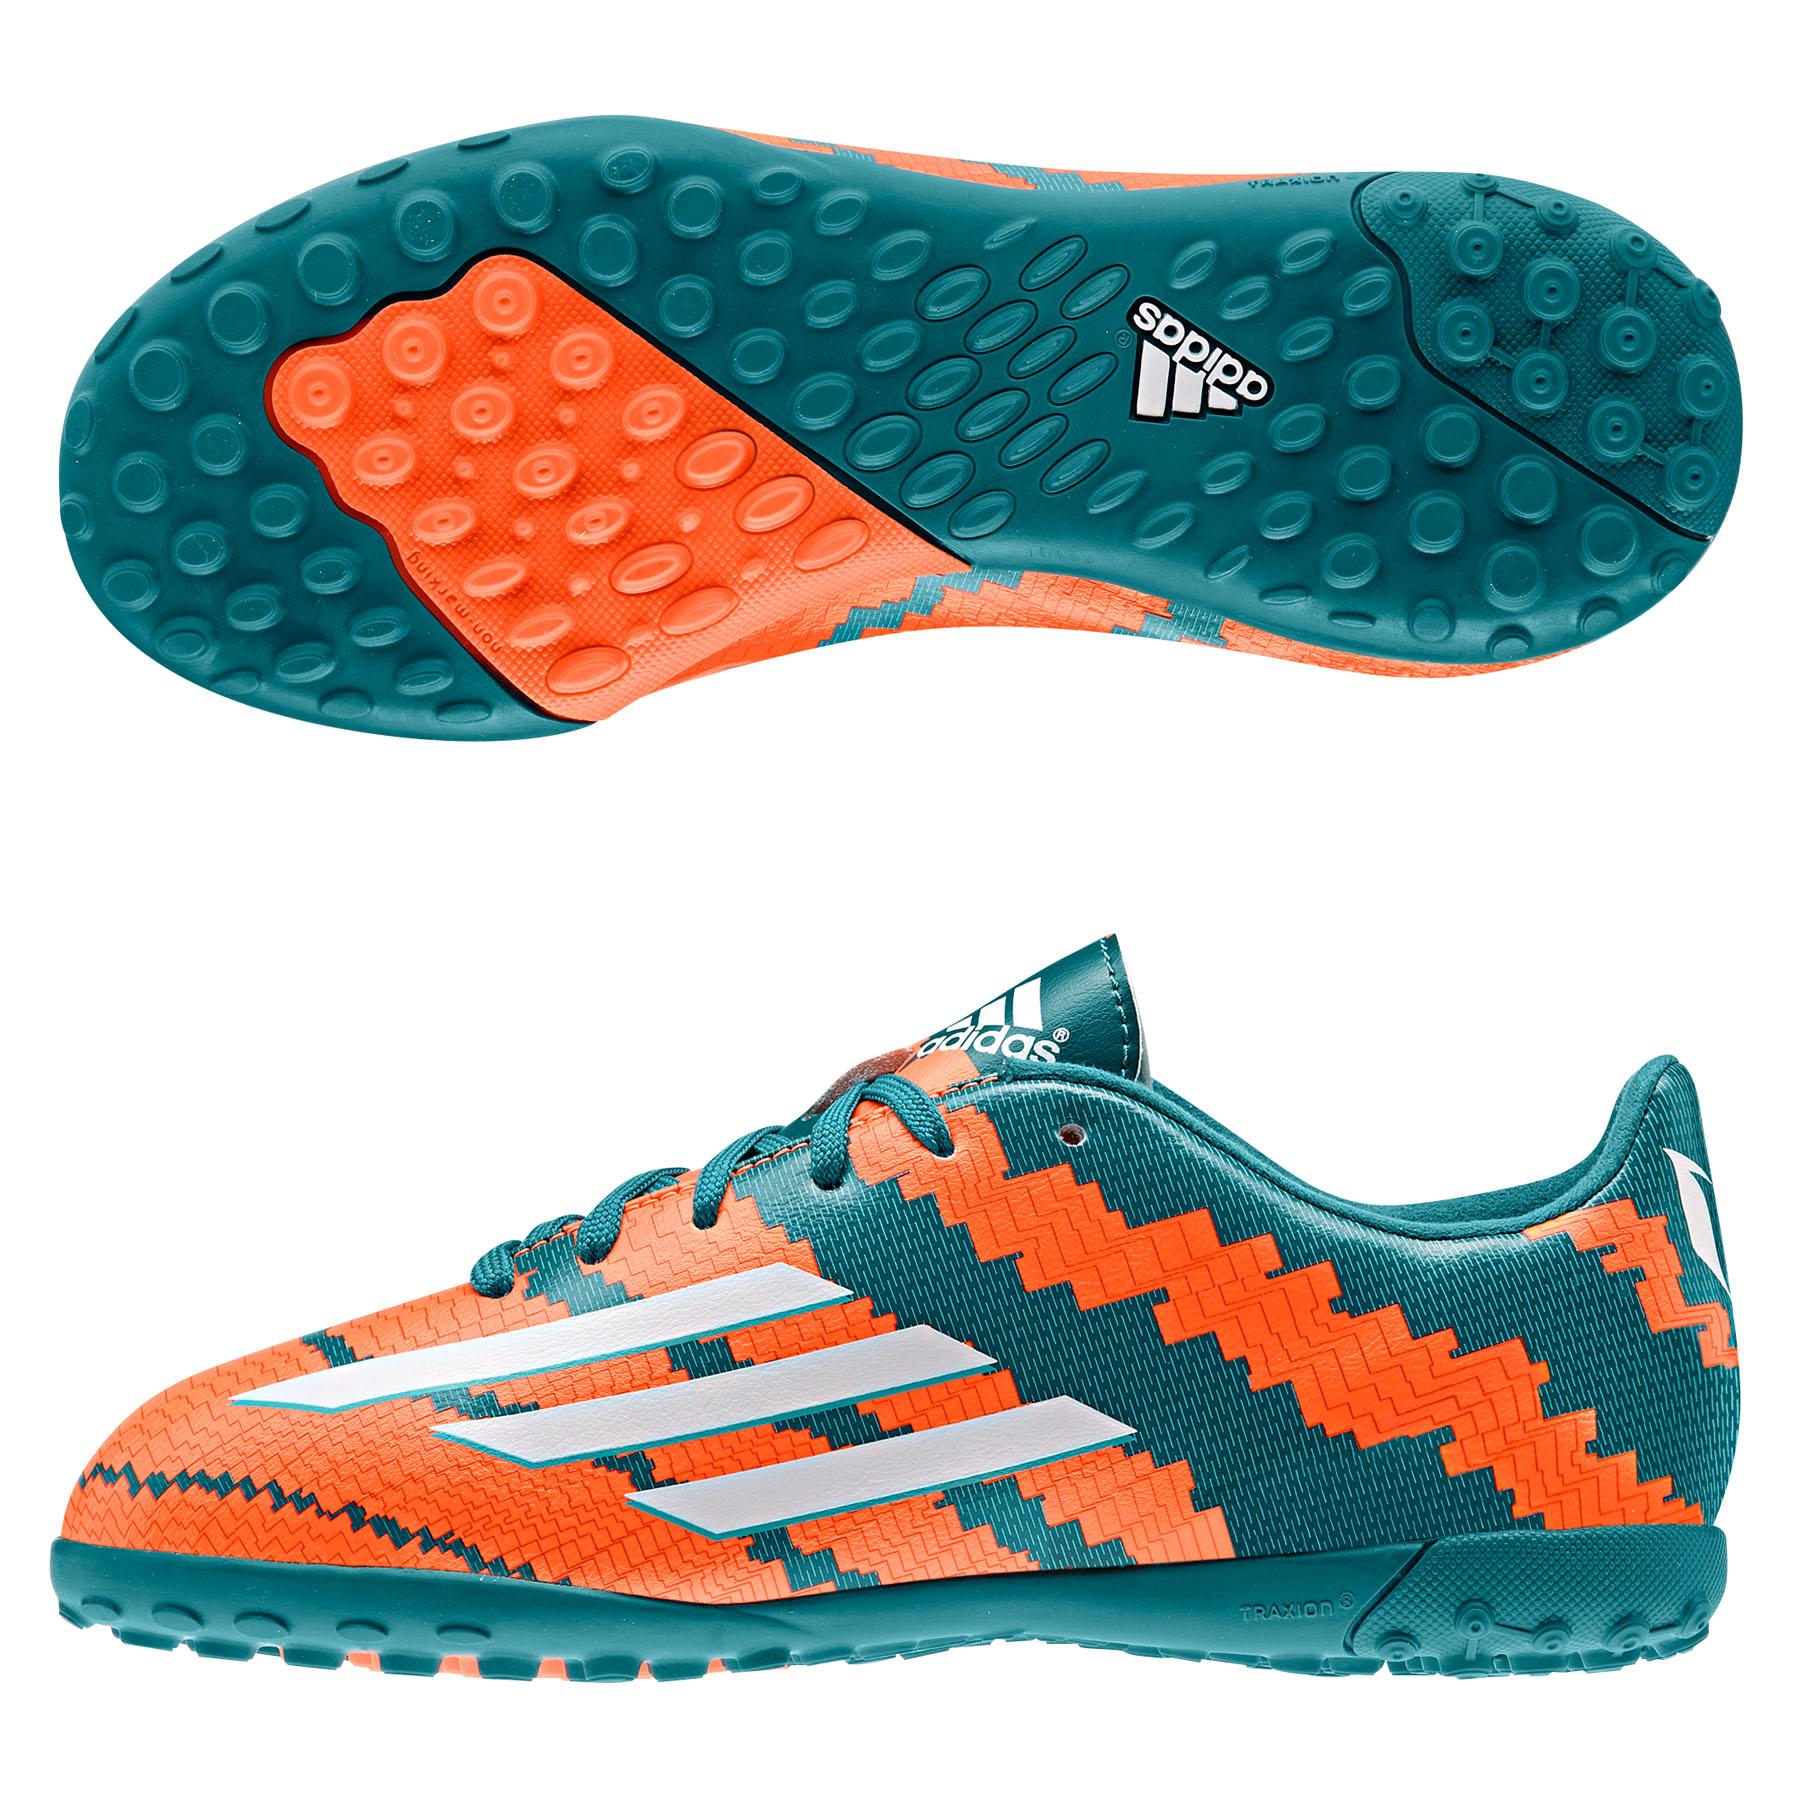 Adidas Messi 10.3 Astroturf Trainers  Kids Lt Blue